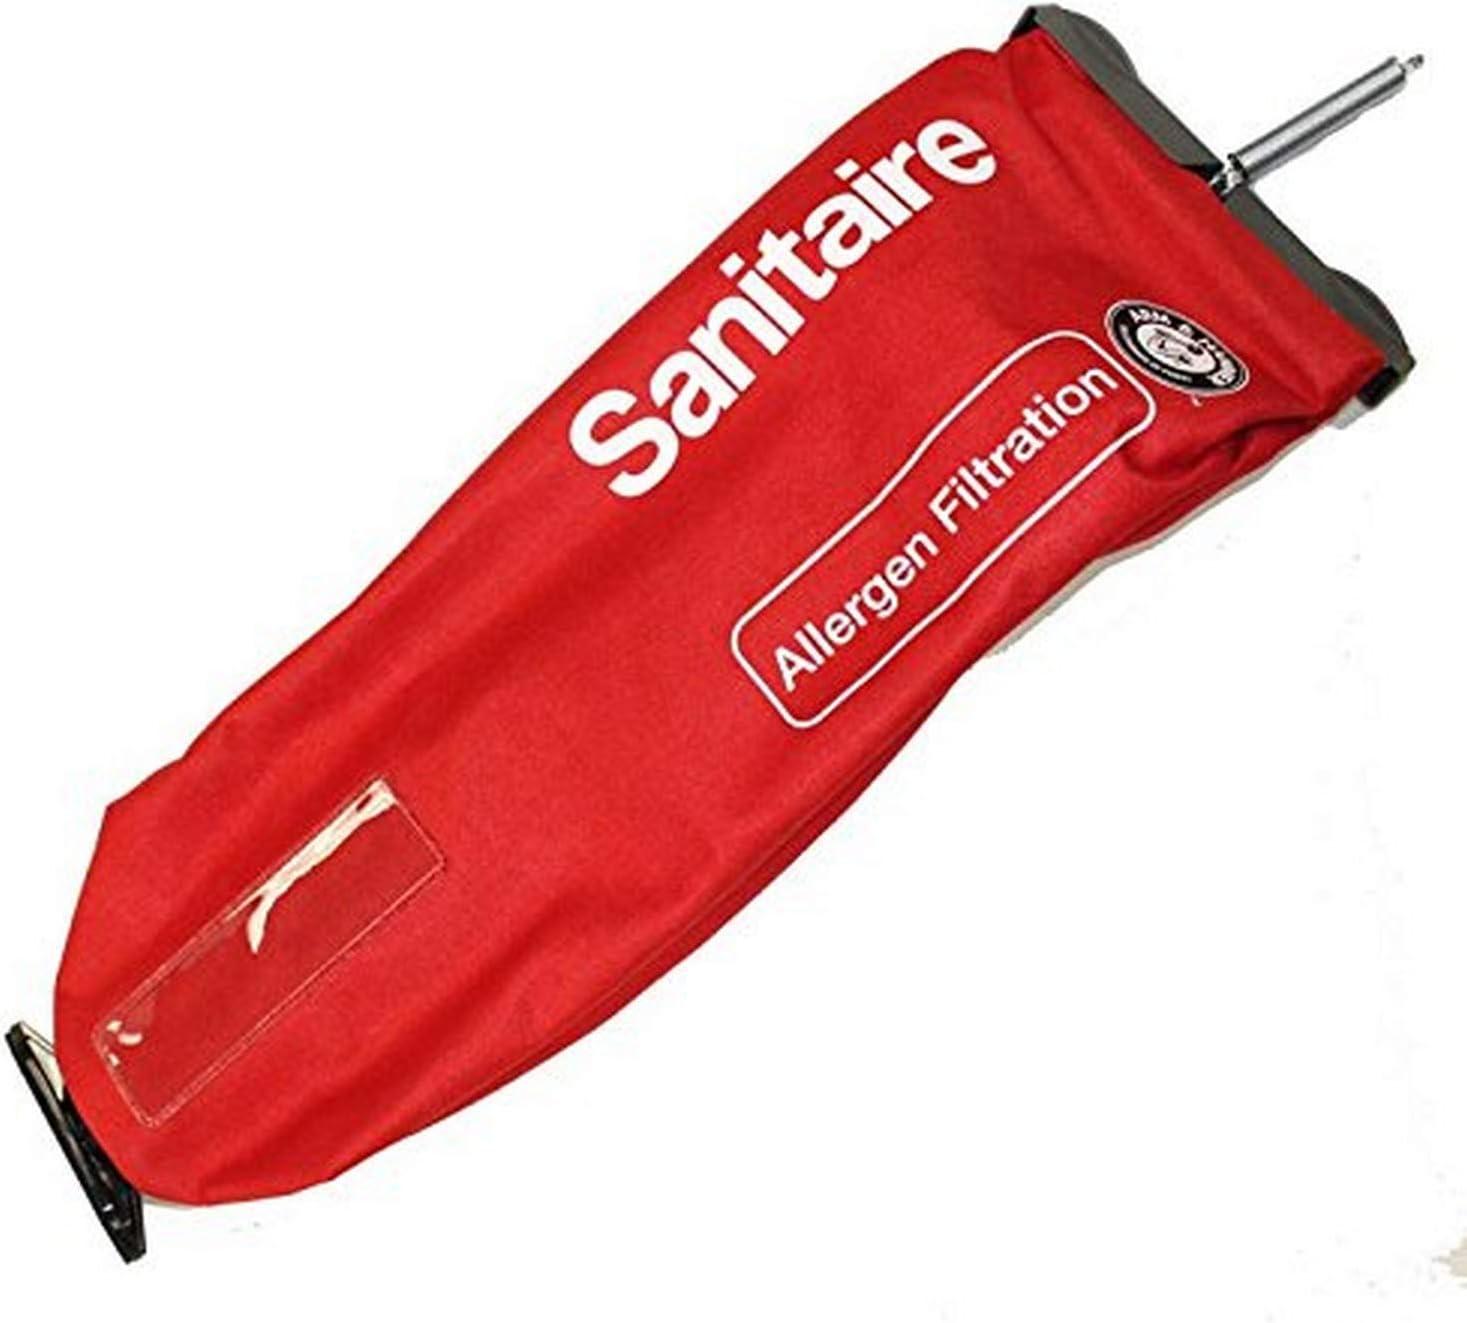 Eureka 53469-23 Cloth, Red Zipper SC888J ST Paper Bag 2 Screw